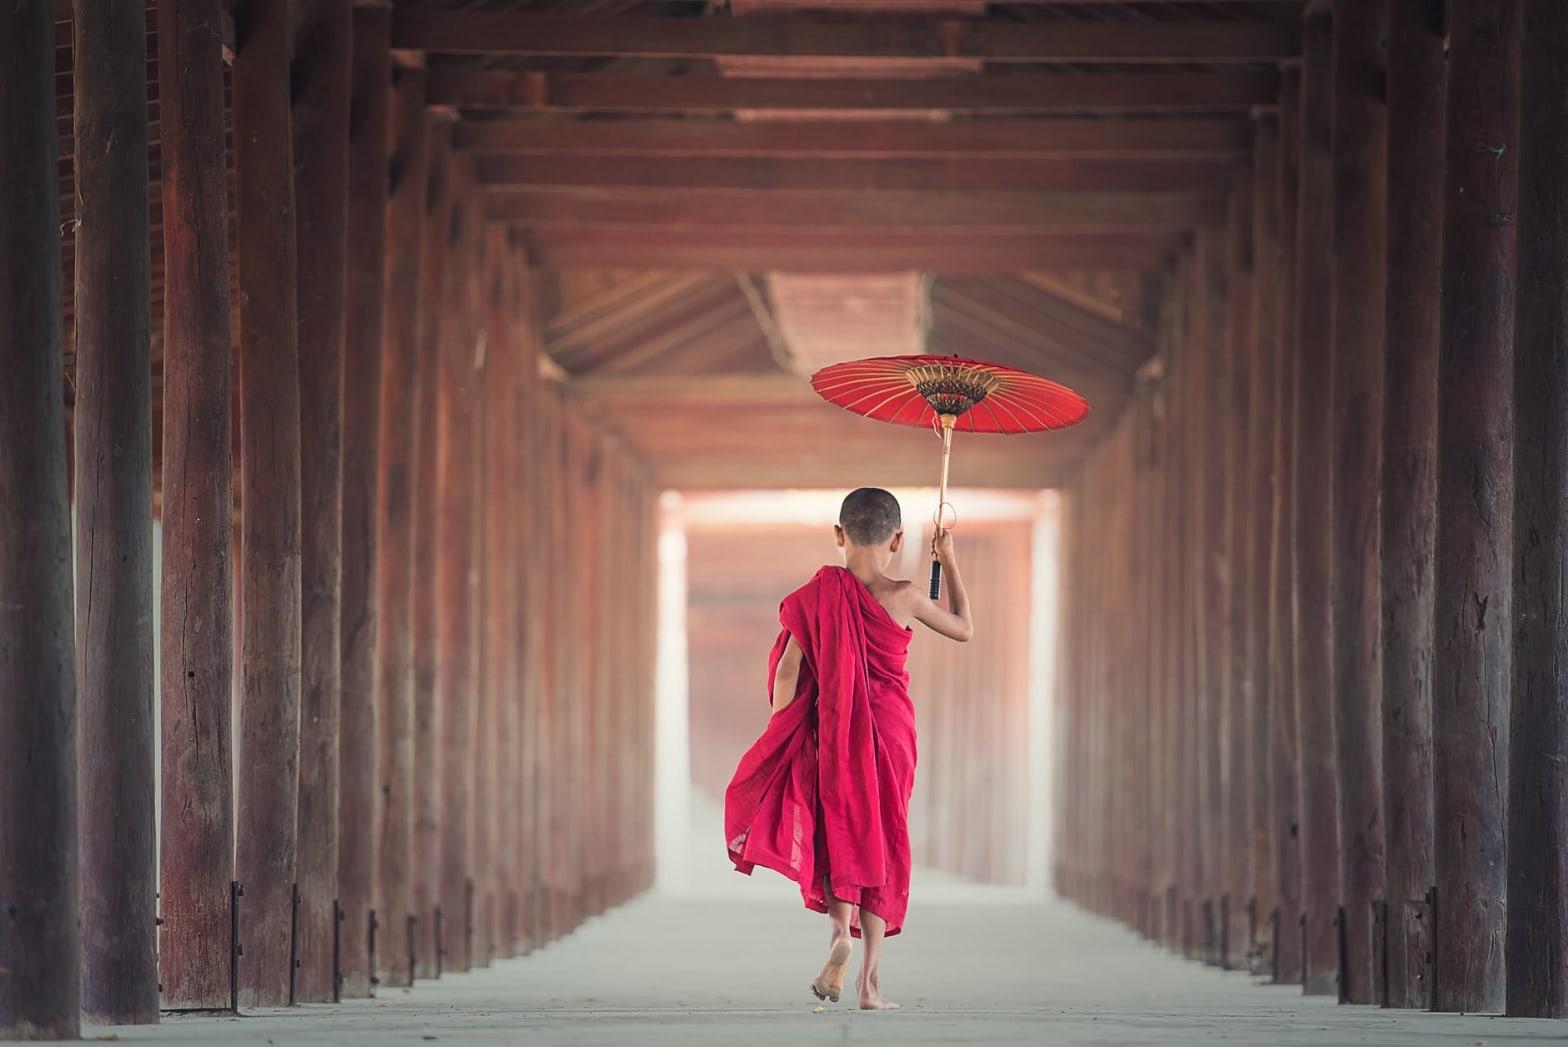 architecture asia asian blur